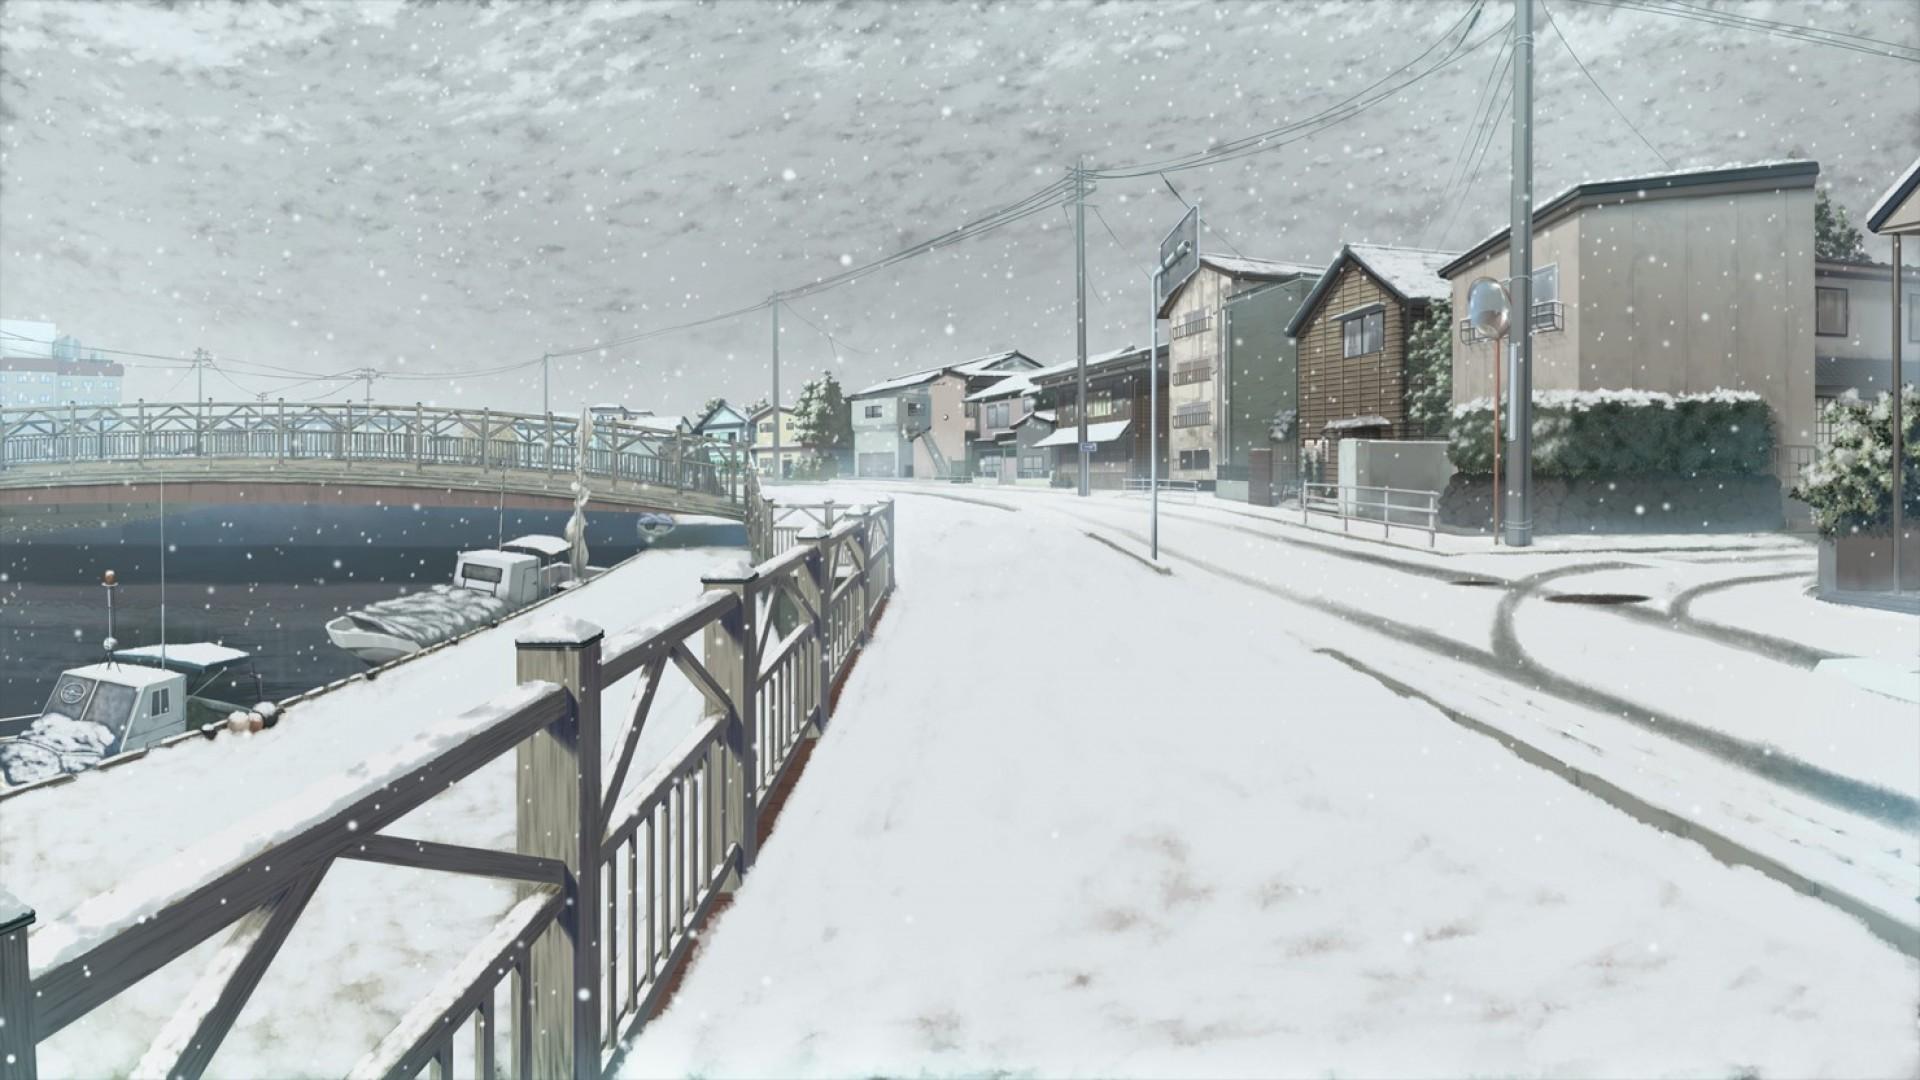 Ulica Ujedinjenja - Page 10 Landscape-boat-anime-snow-winter-bridge-river-harbor-Freezing-sailing-weather-season-blizzard-residential-area-geological-phenomenon-winter-storm-59539